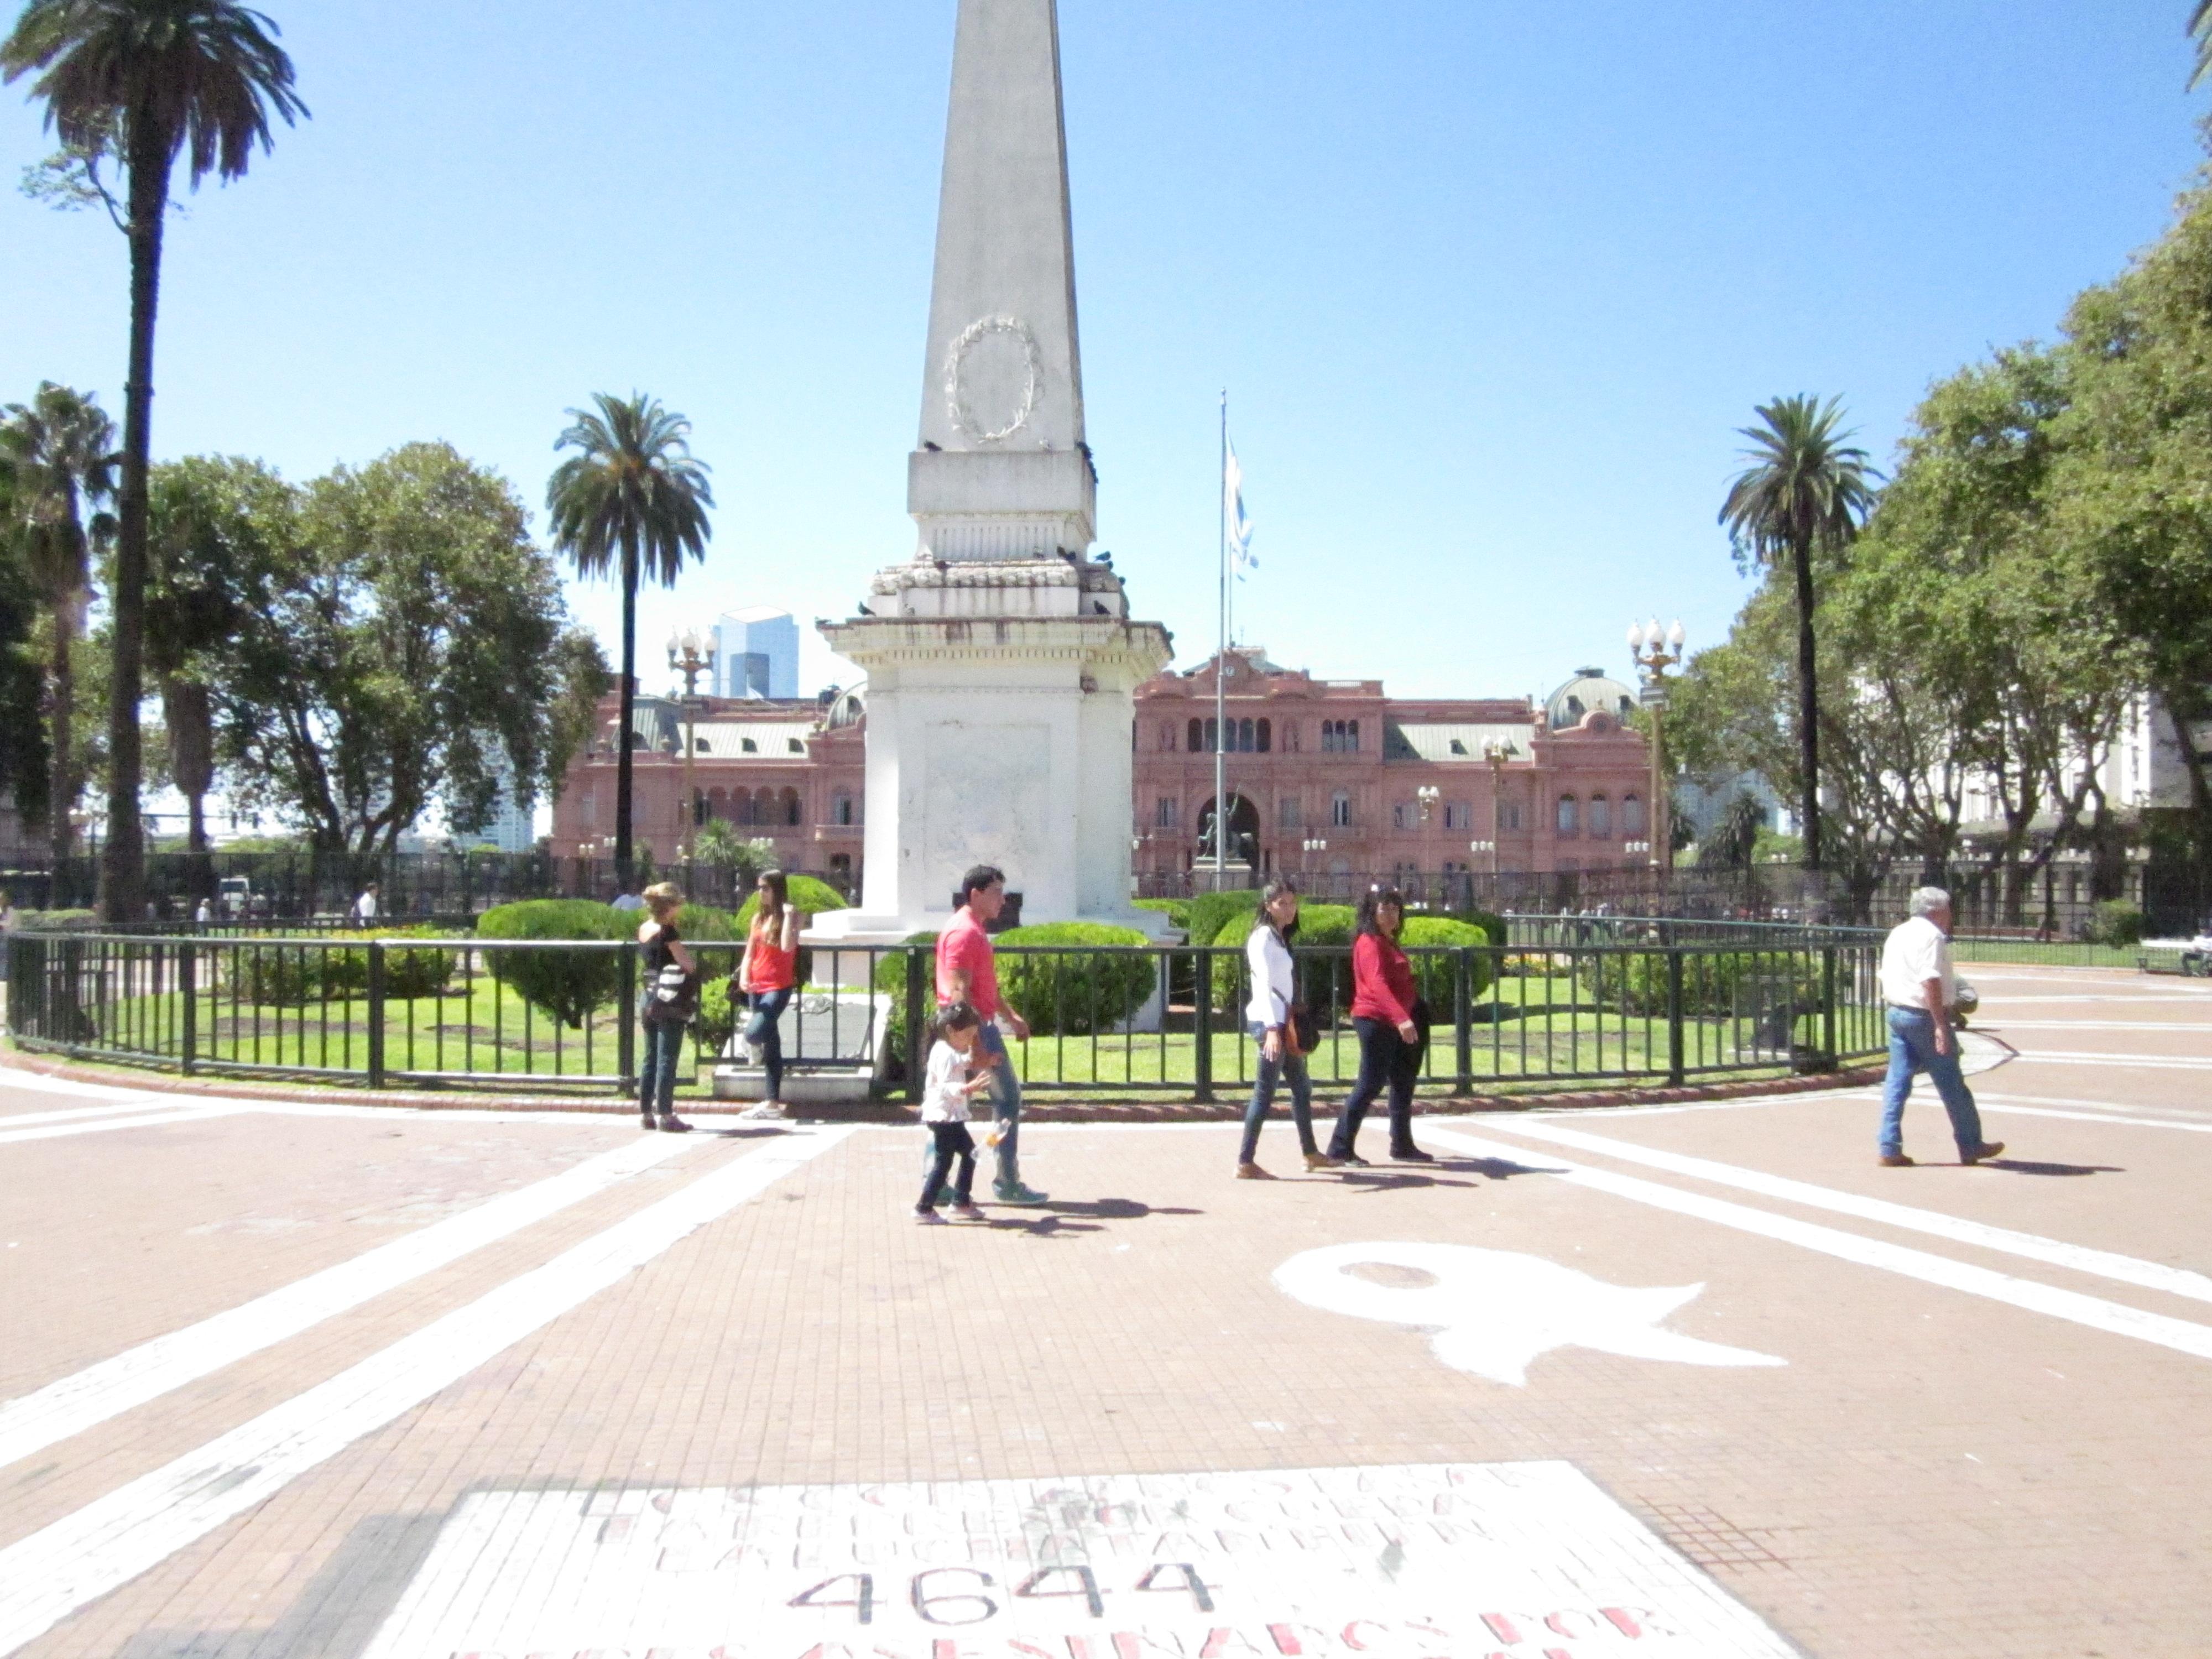 CAPAStudyAbroad_BuenosAires_Spring2016_From_Liz_Hendry_-_Plaza_de_mayo_and_the_casa_rosada.jpg